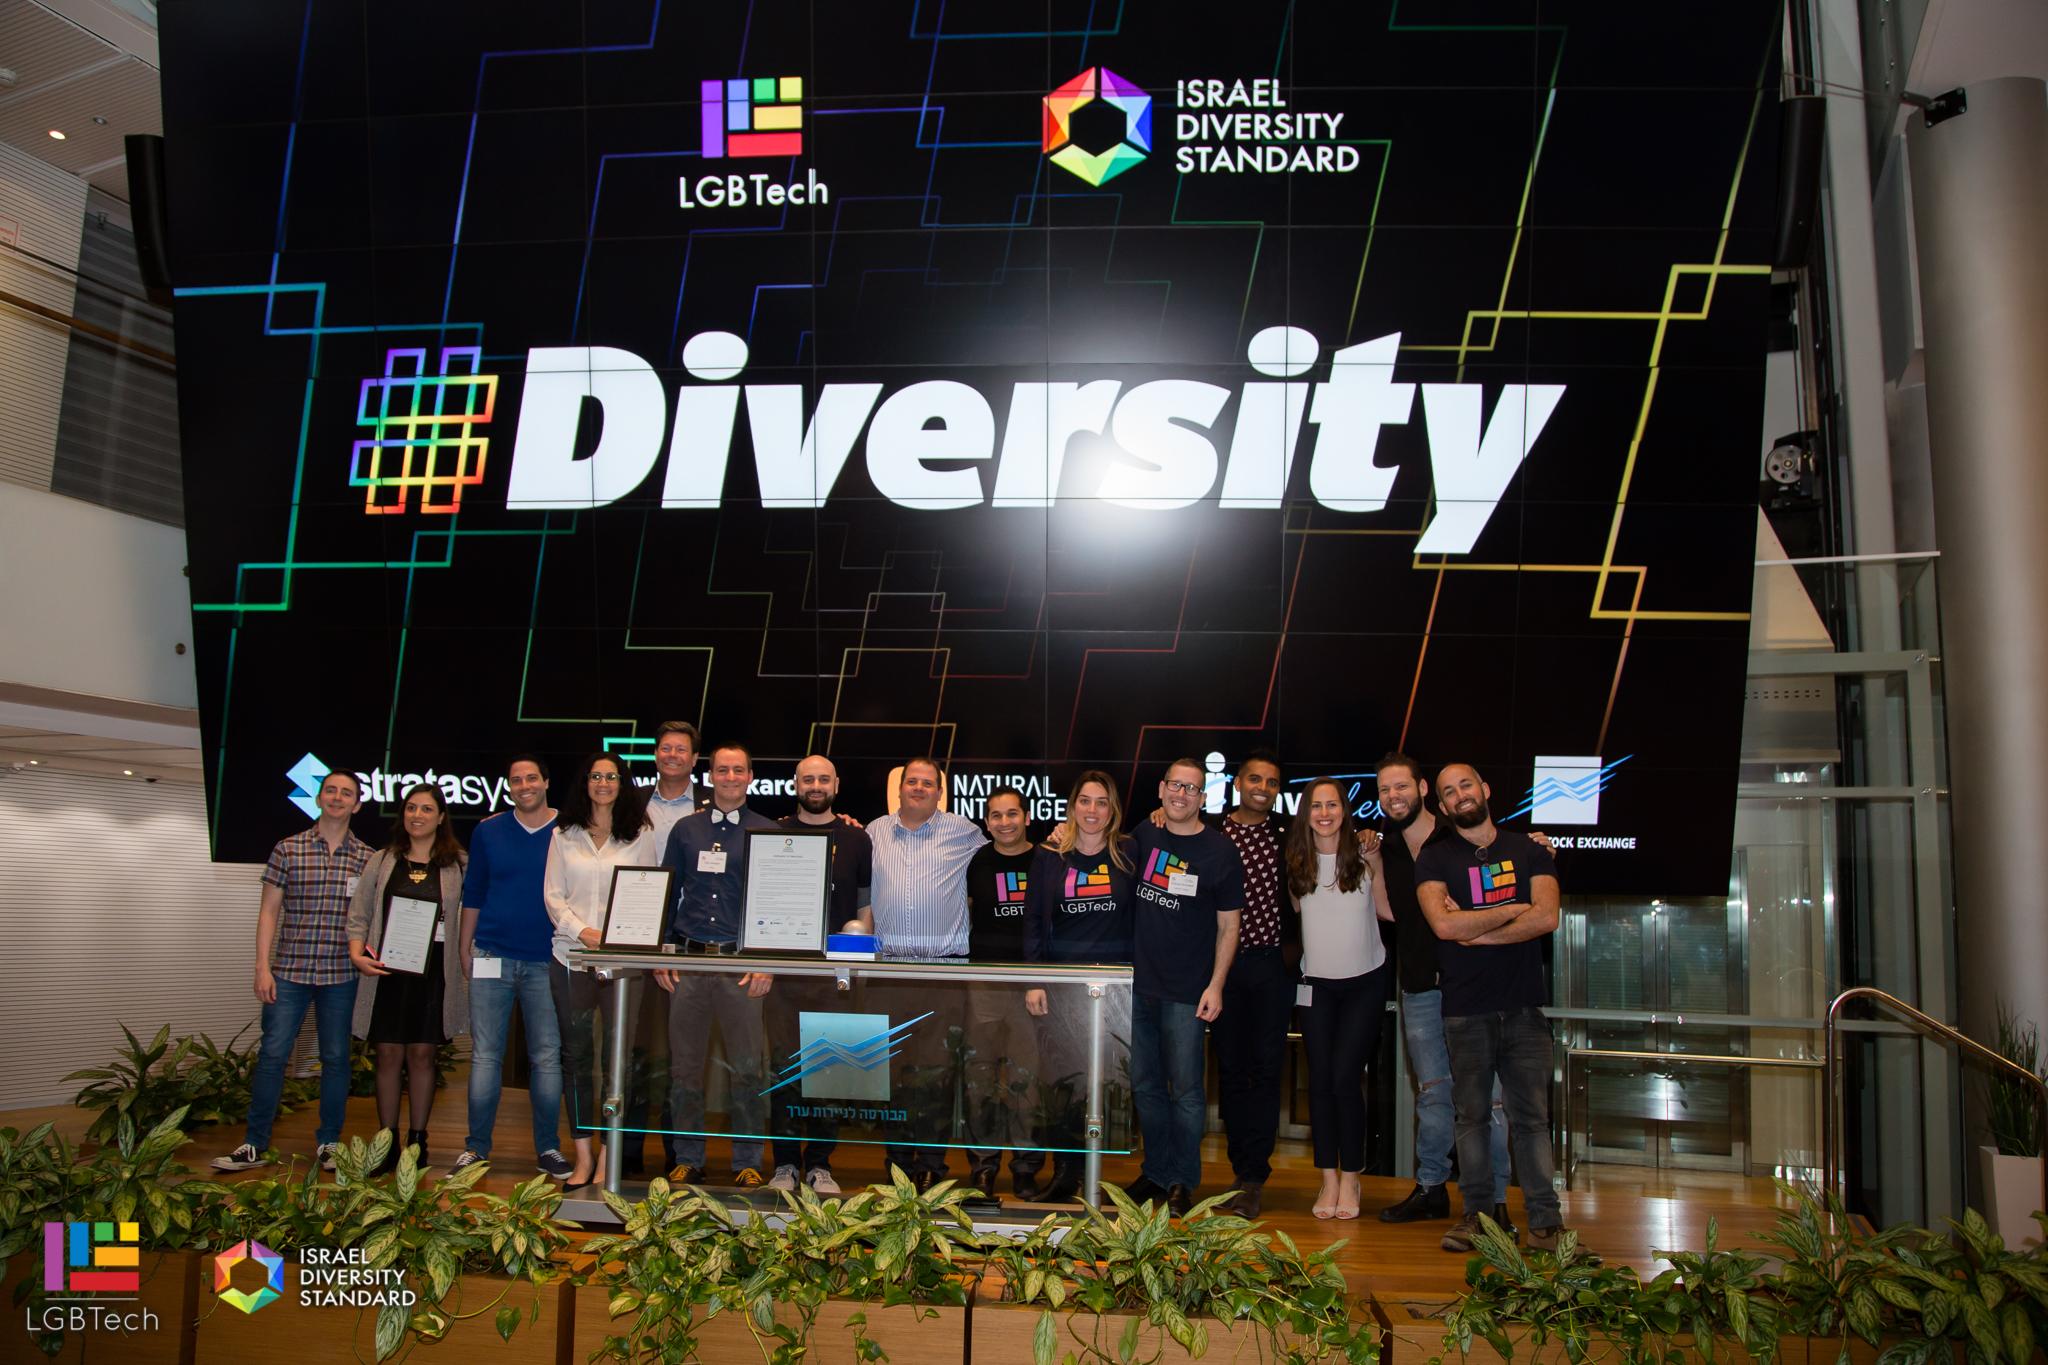 Diversity-119.jpg